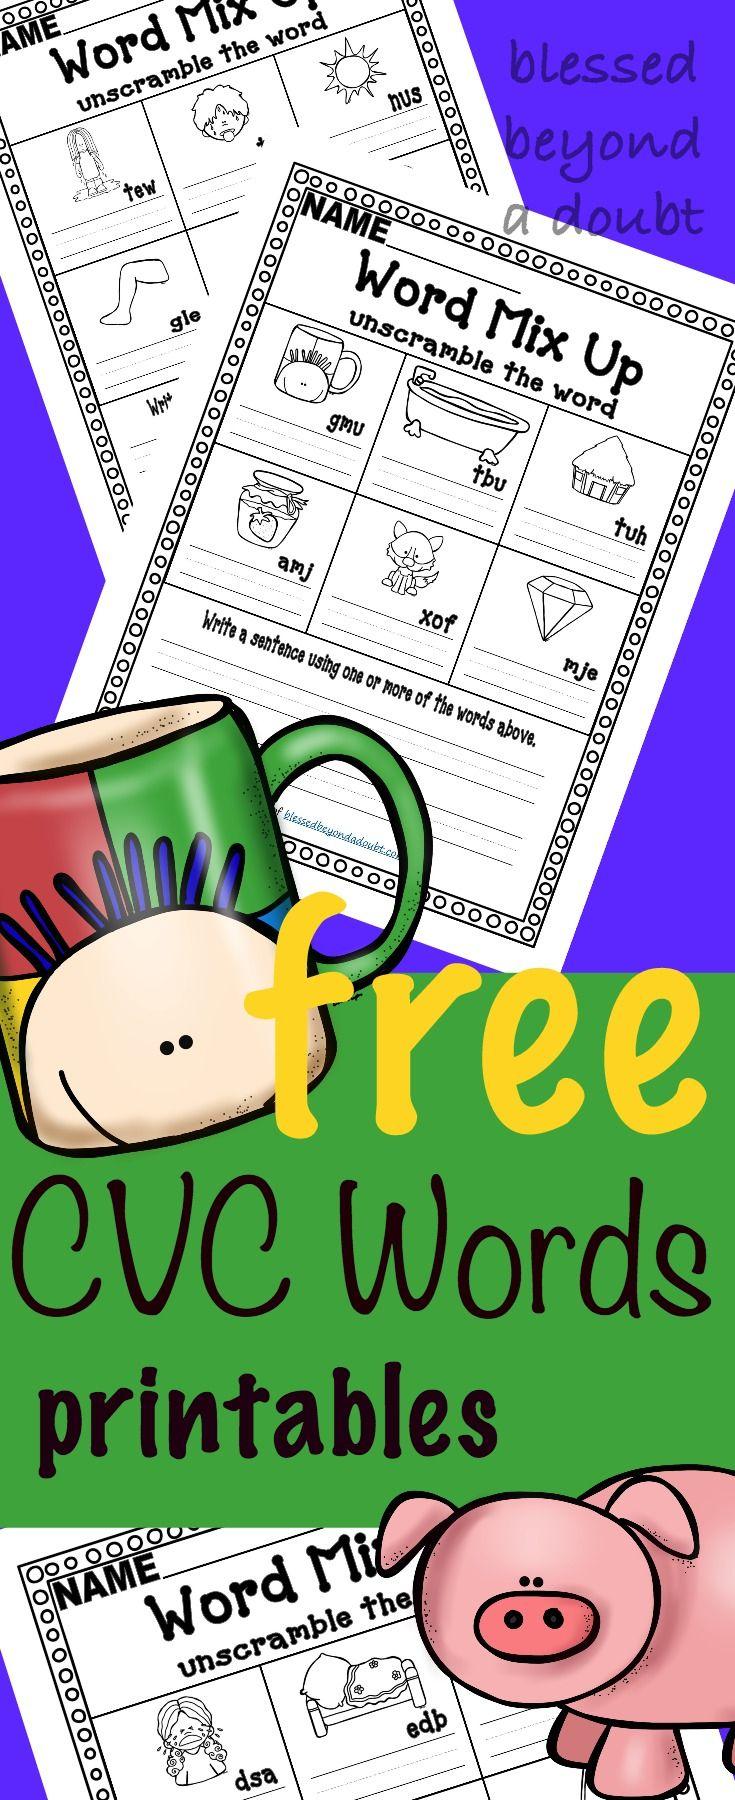 FREE CVC Word Worksheets Unscramble the CVC word